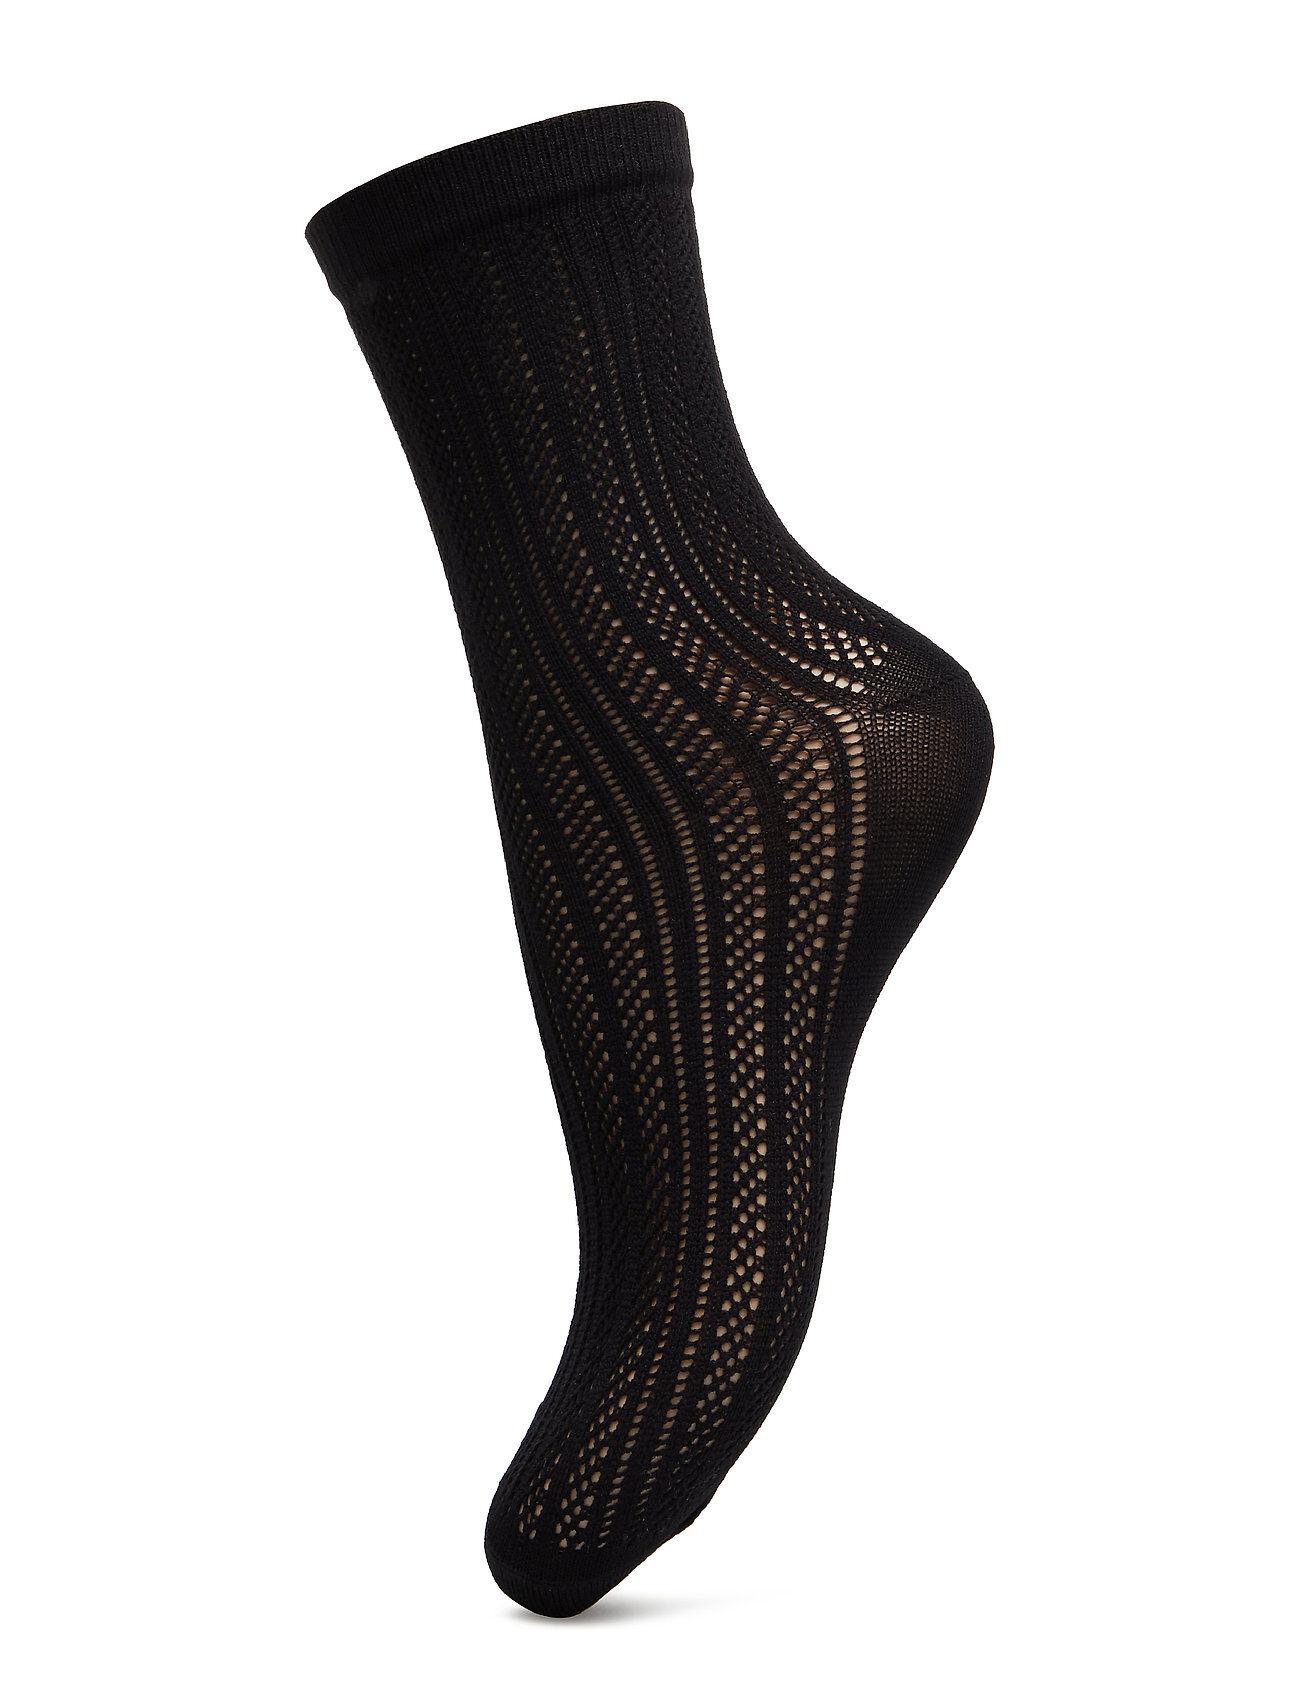 Swedish Stockings Irma Support Tights 30d Sukkahousut Musta Swedish Stockings